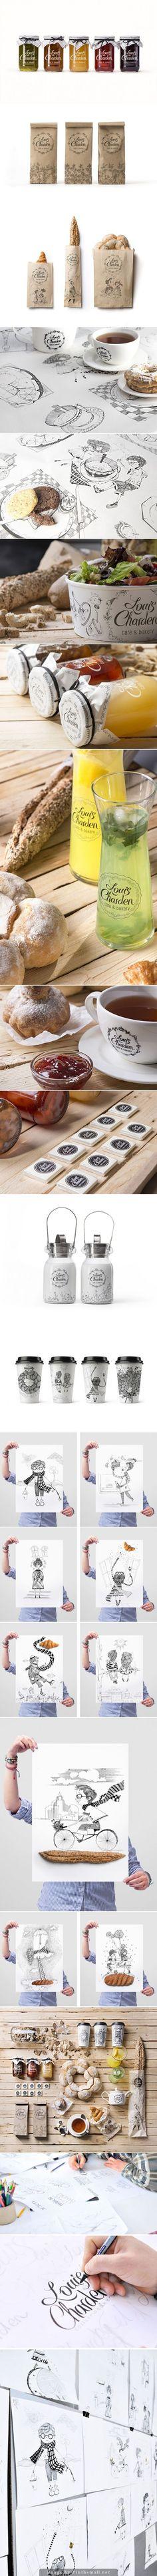 Louis Charden Creative Agency: Backbone Branding Studio  Location: Yerevan, Armenia Project Type: Commercial Work: